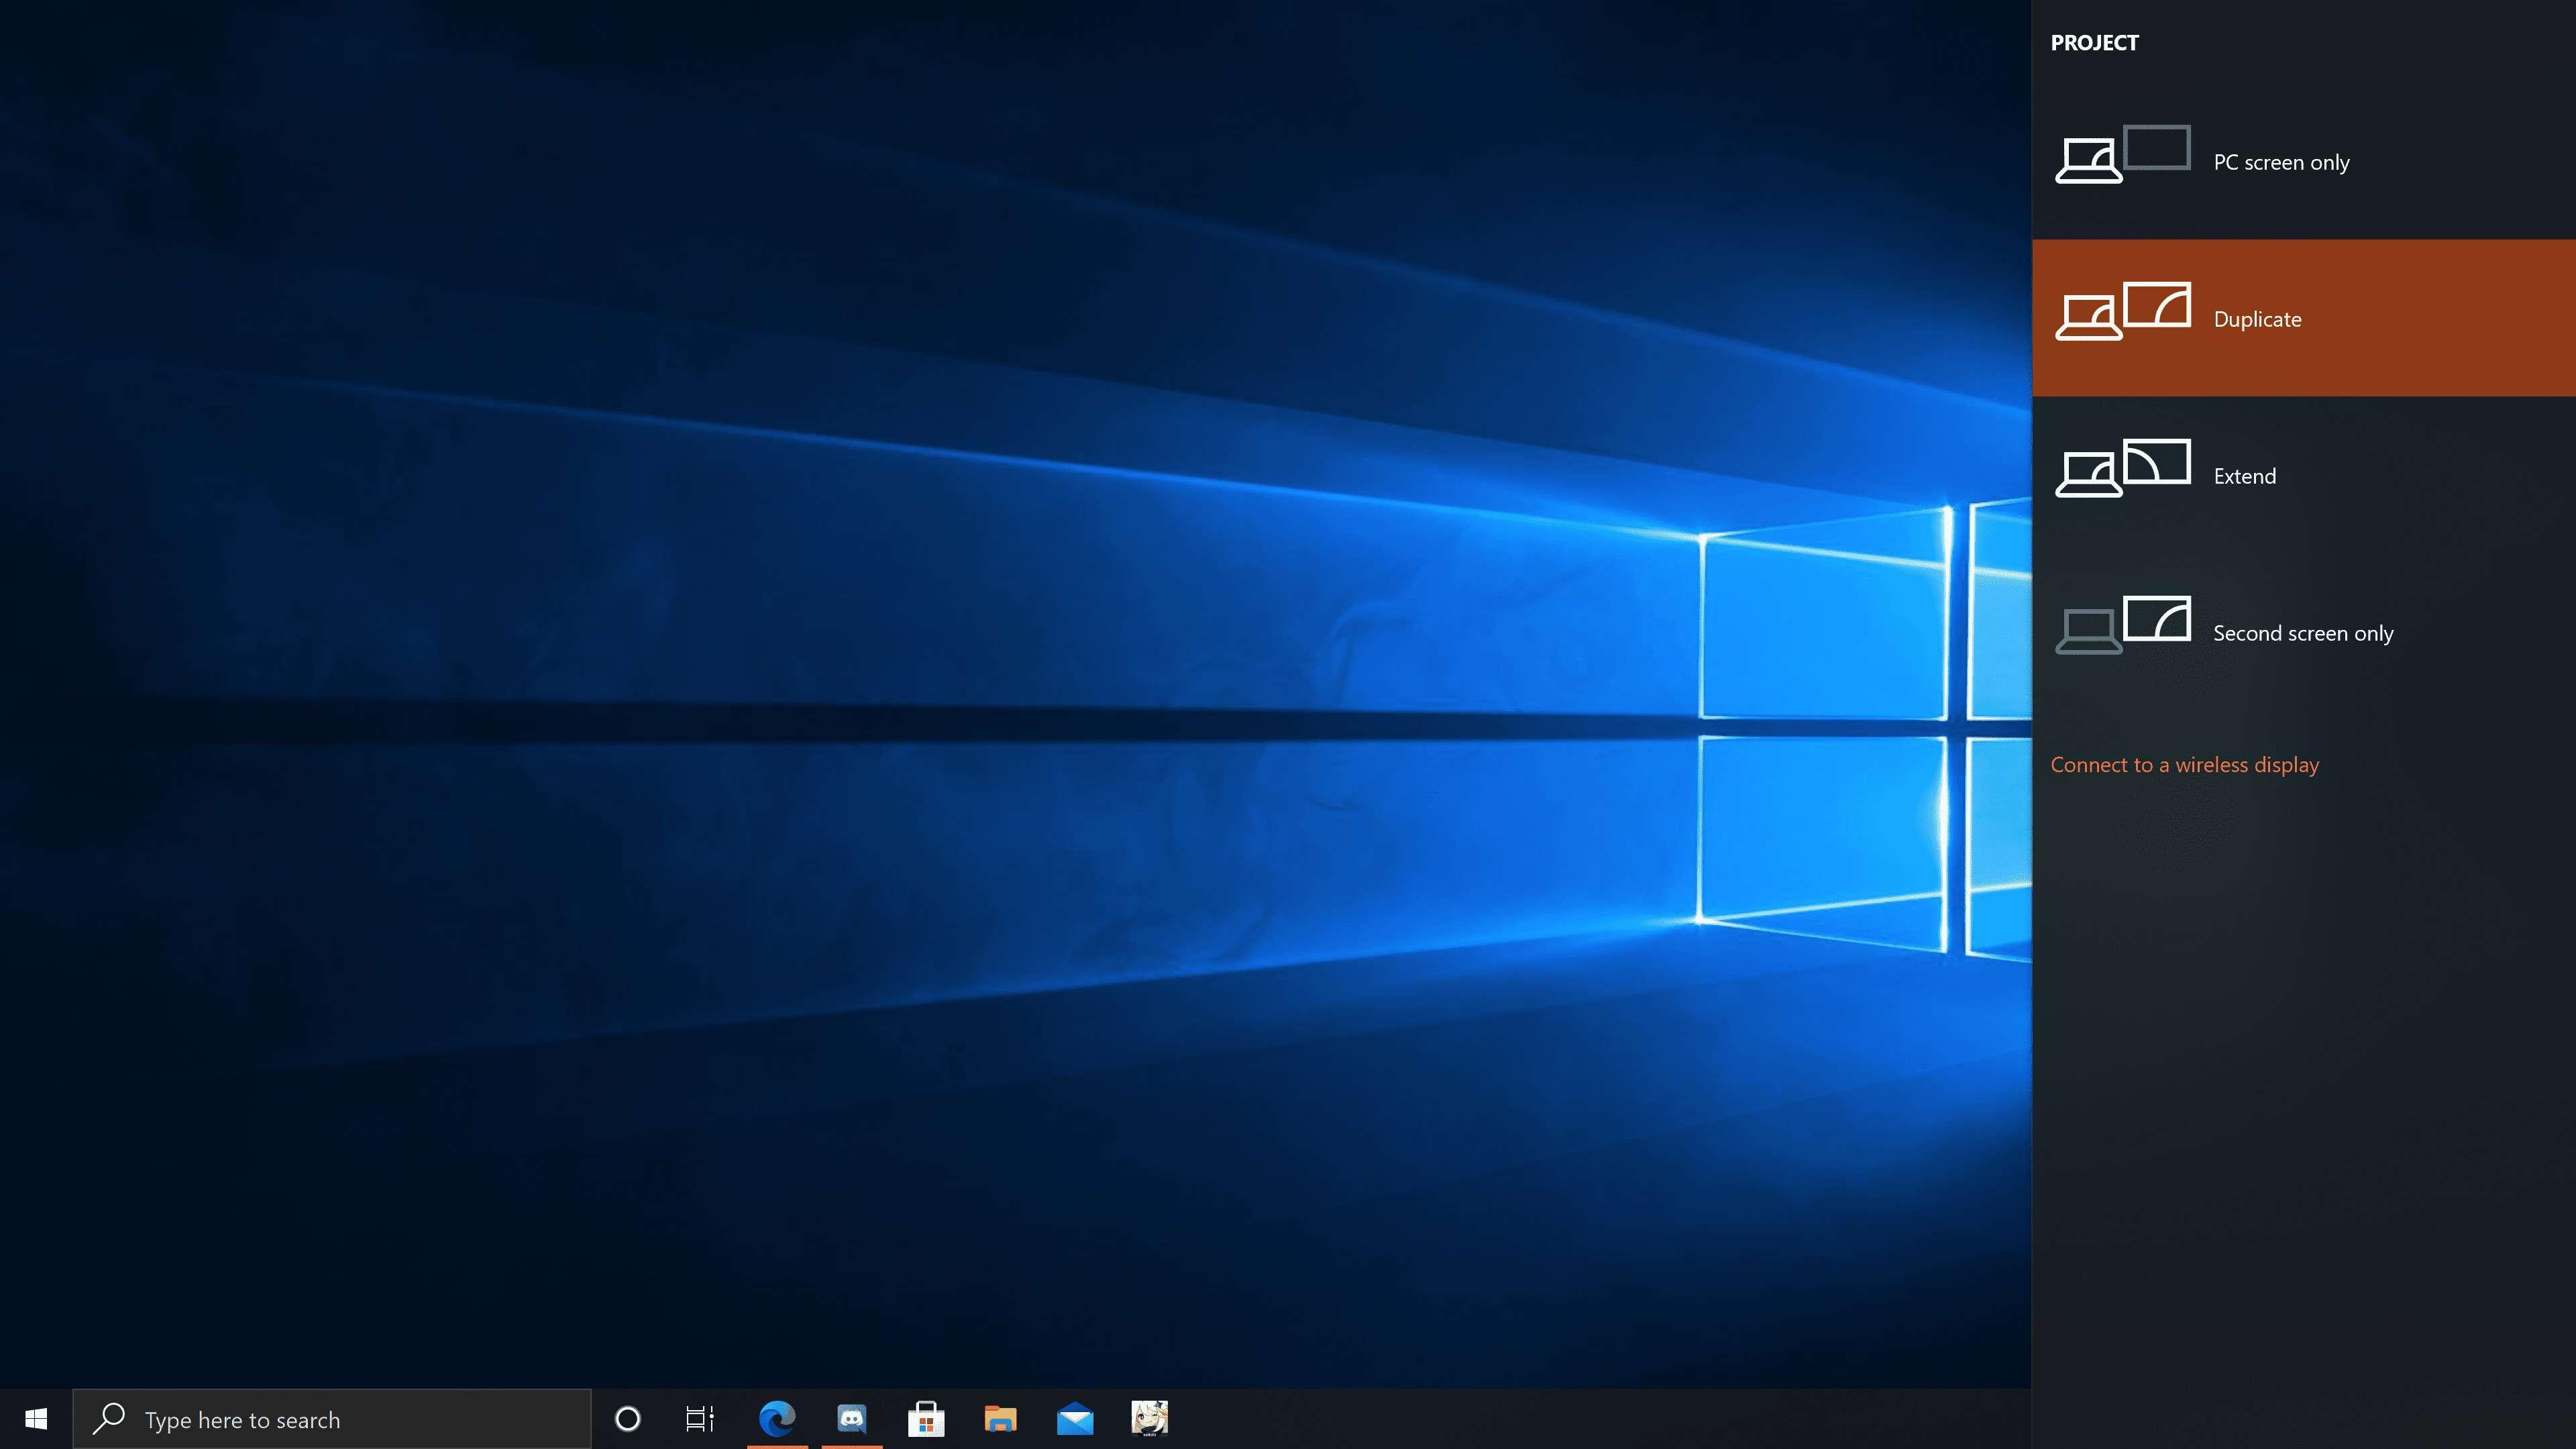 The Windows 10 Projection Menu